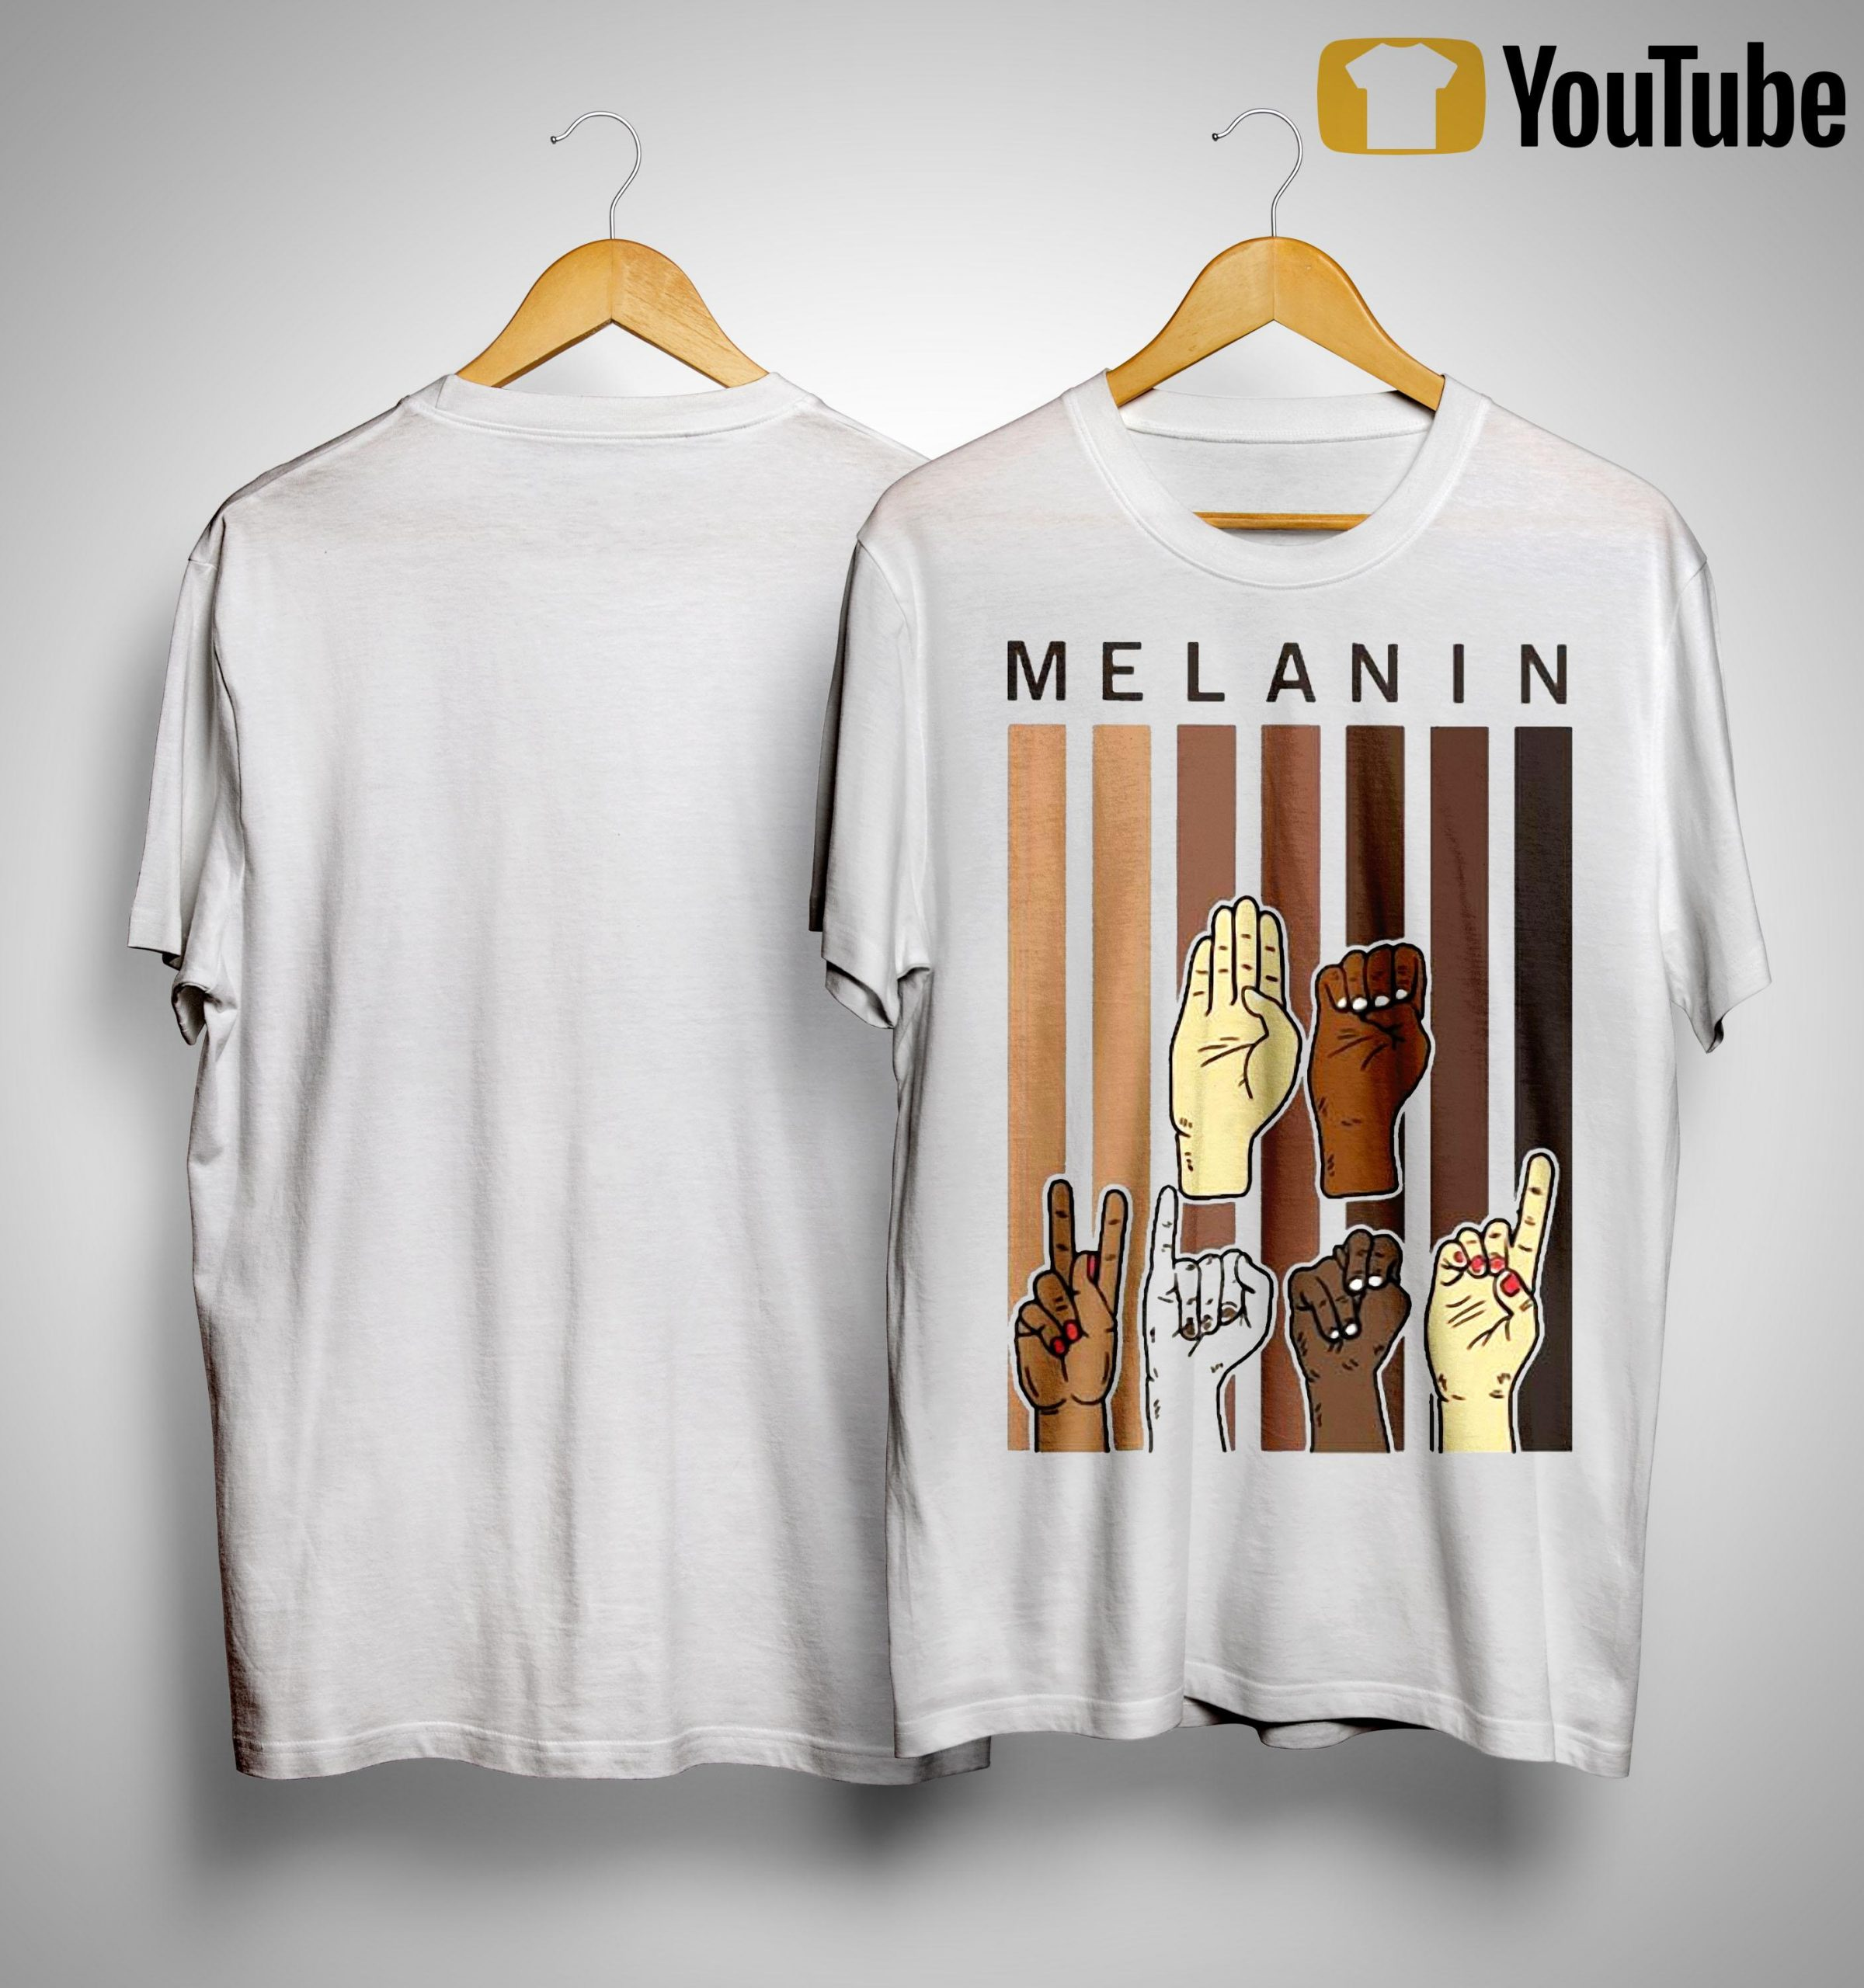 Sign Language Hands Melanin Shirt